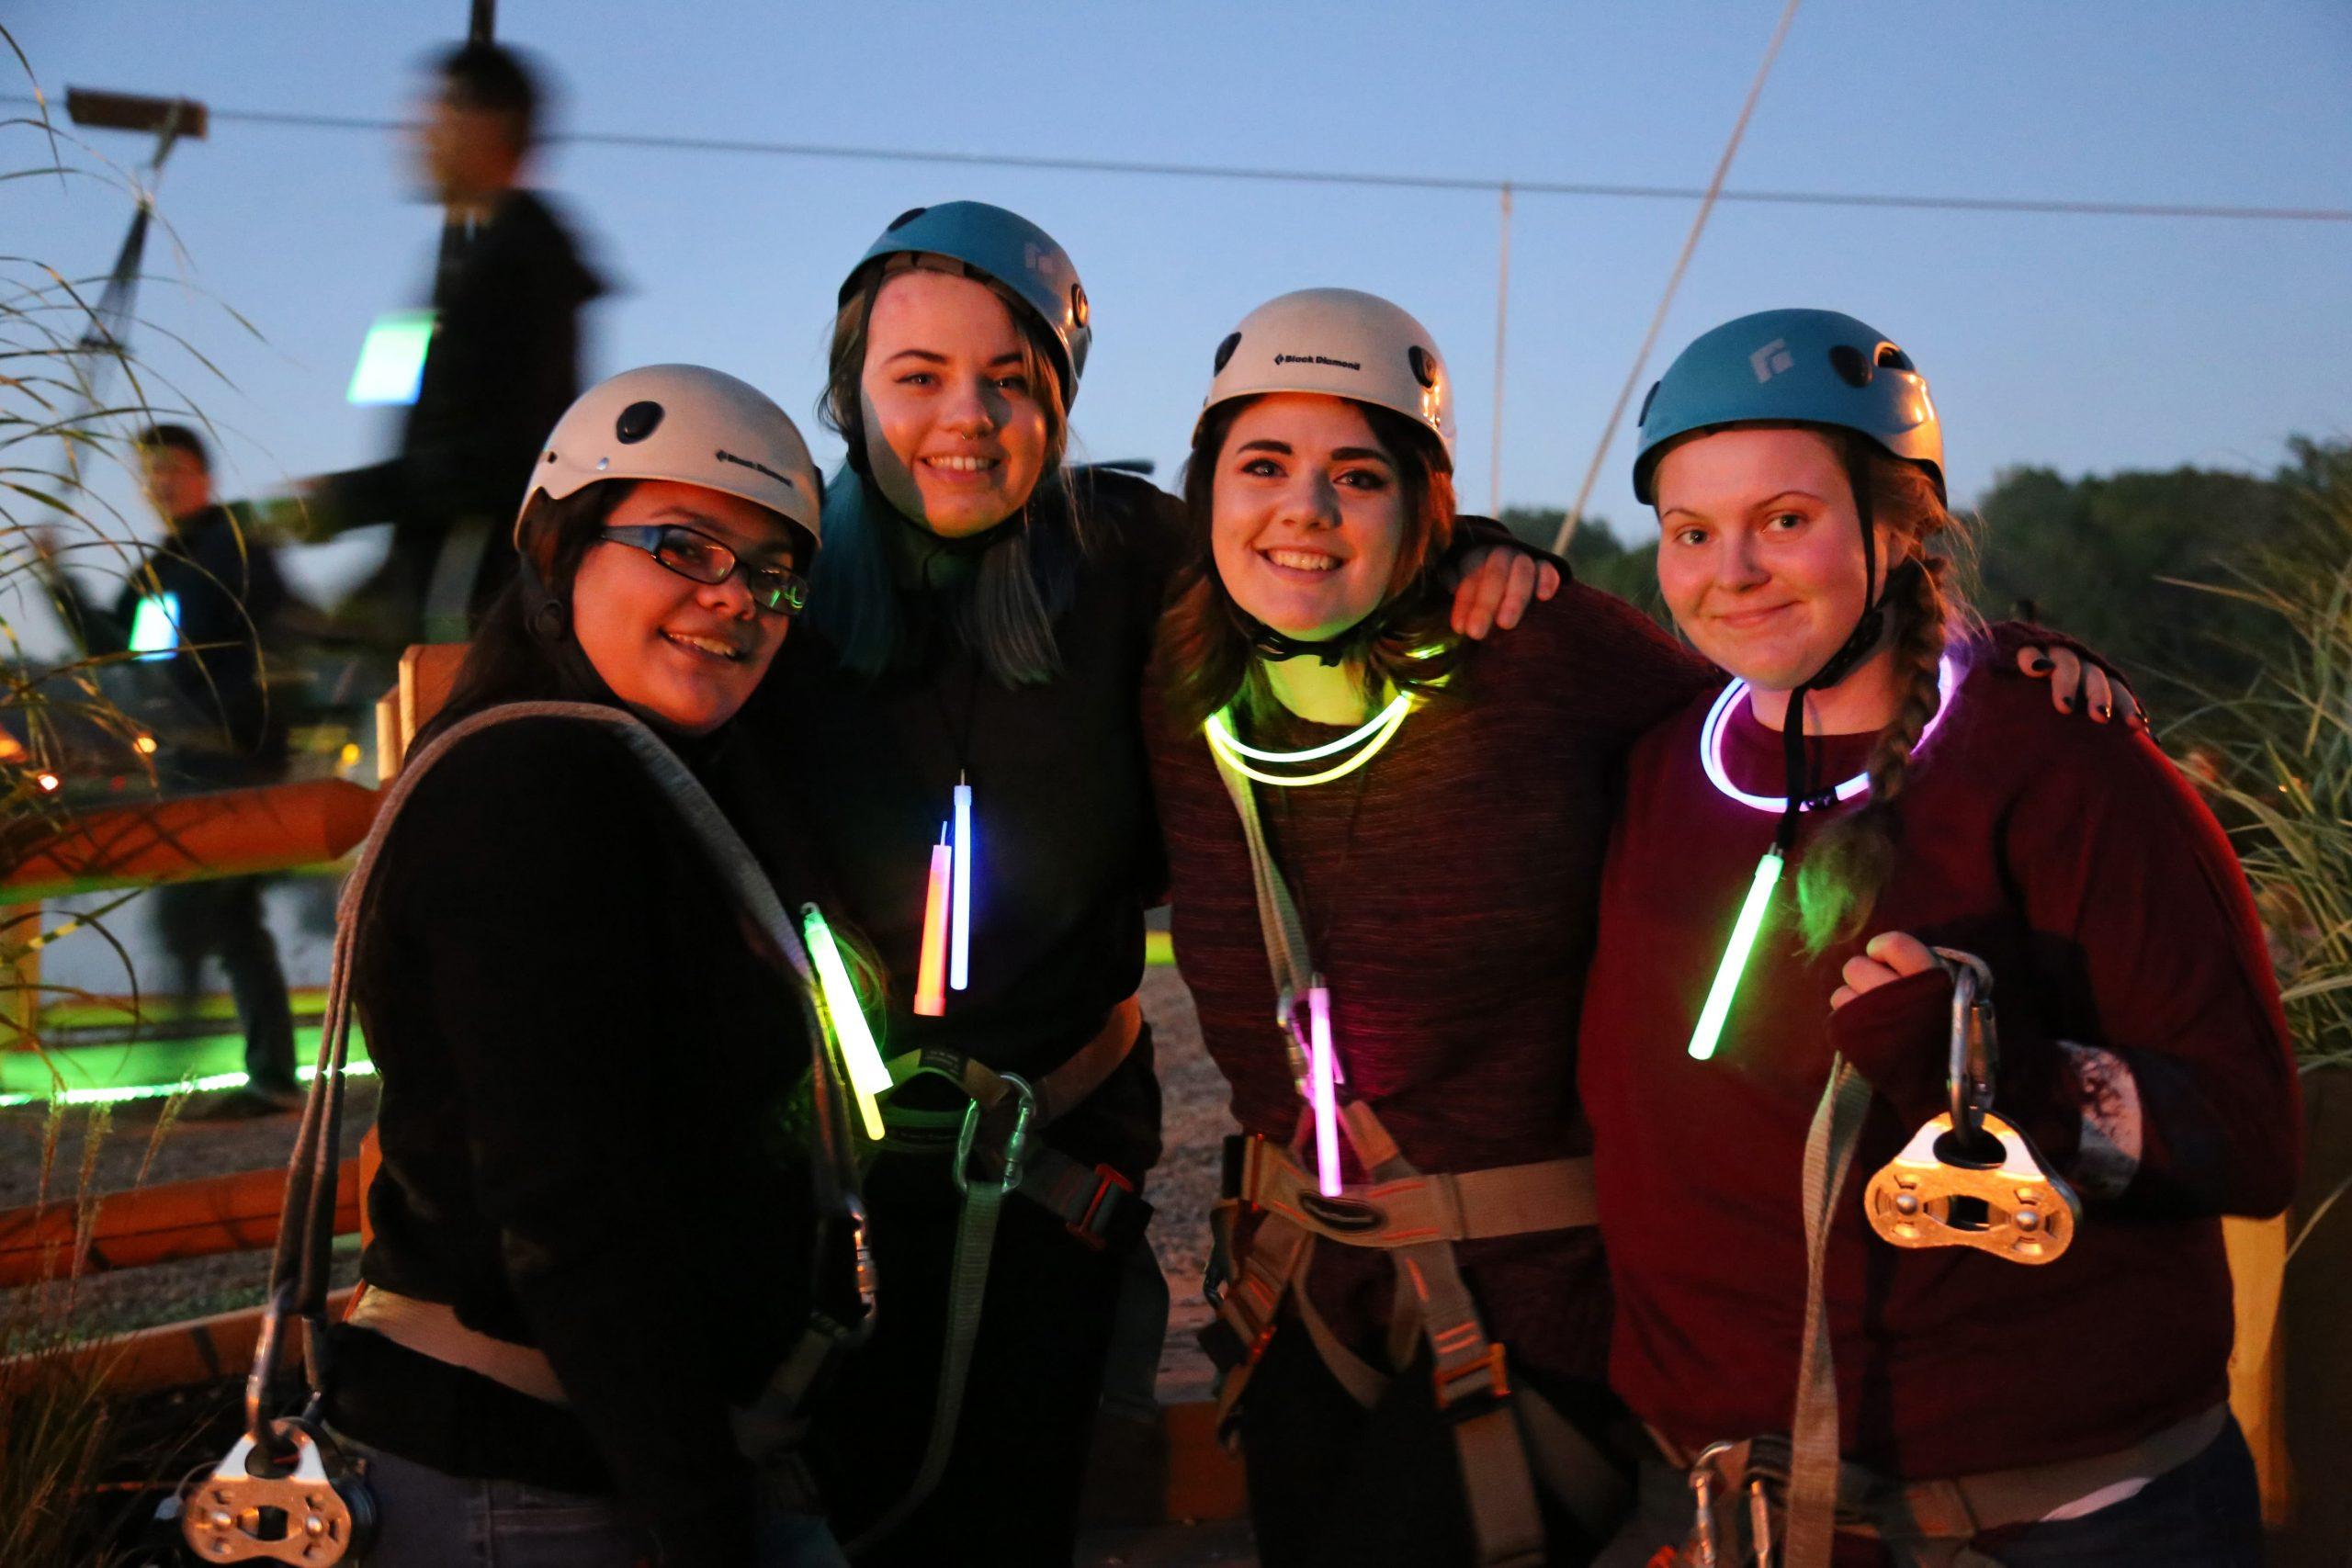 girls wearing helmets and glow sticks after zipline